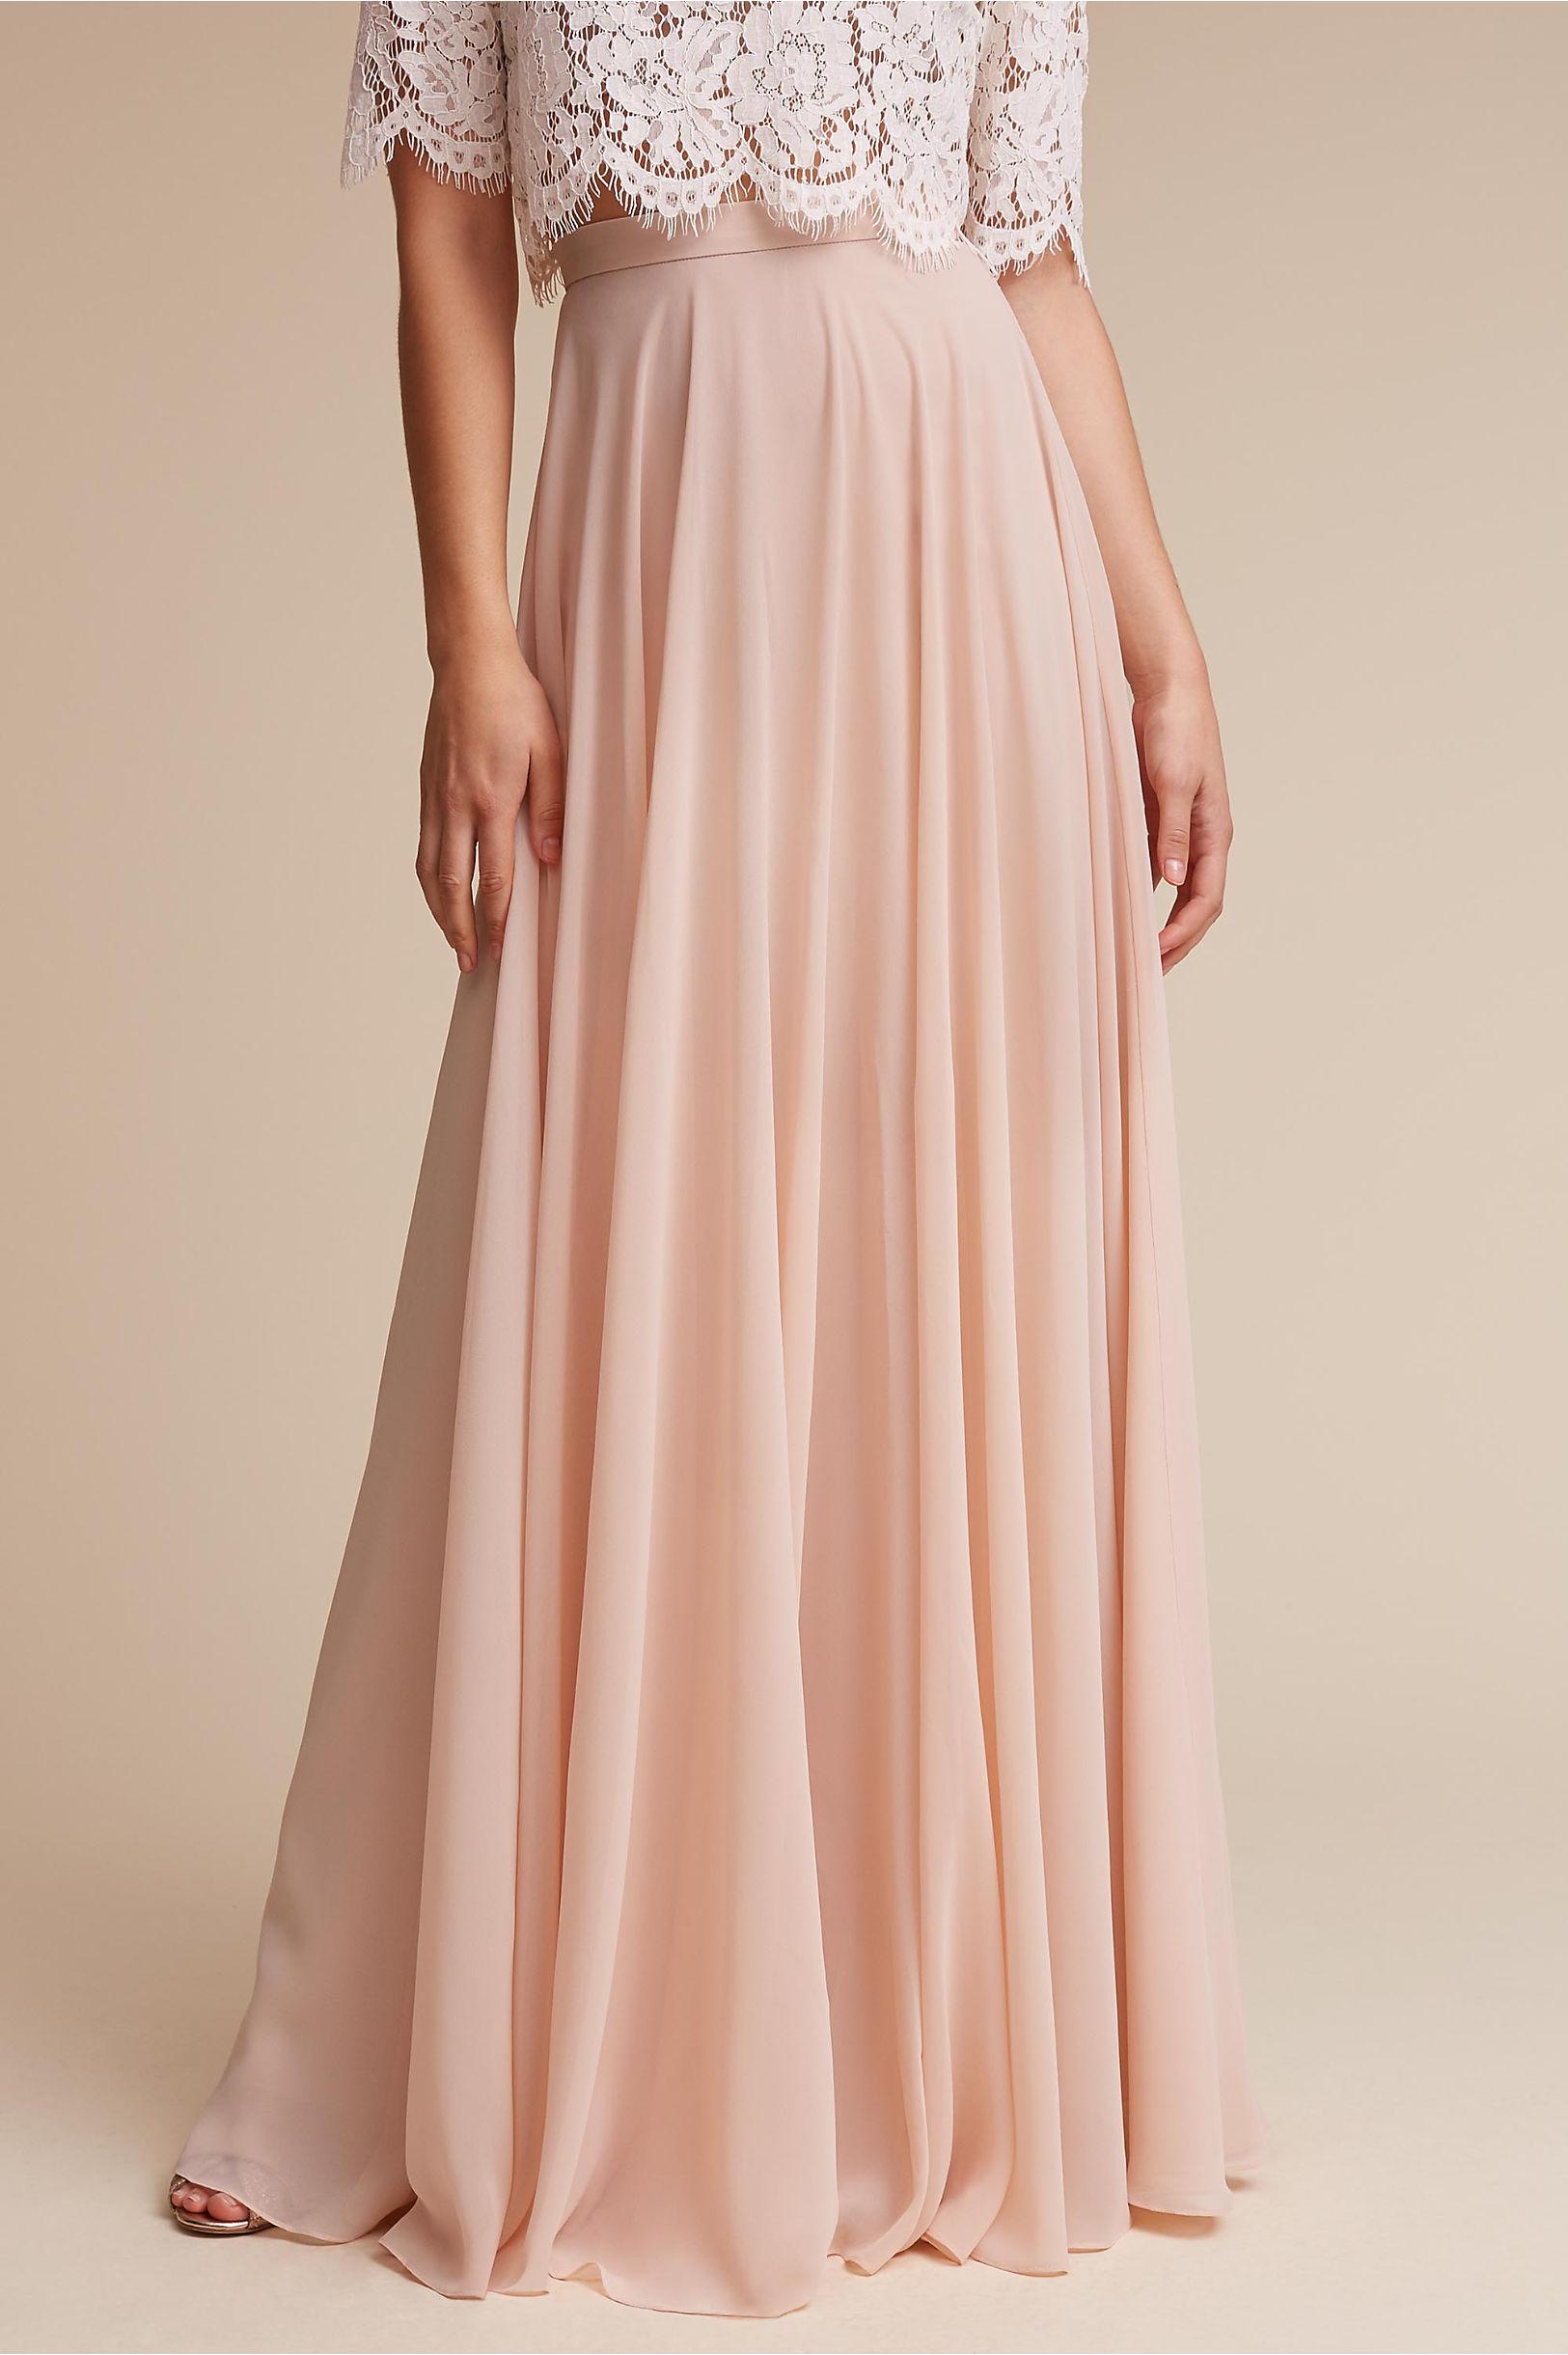 Two Piece Bridesmaid Dresses &amp- Separates - BHLDN